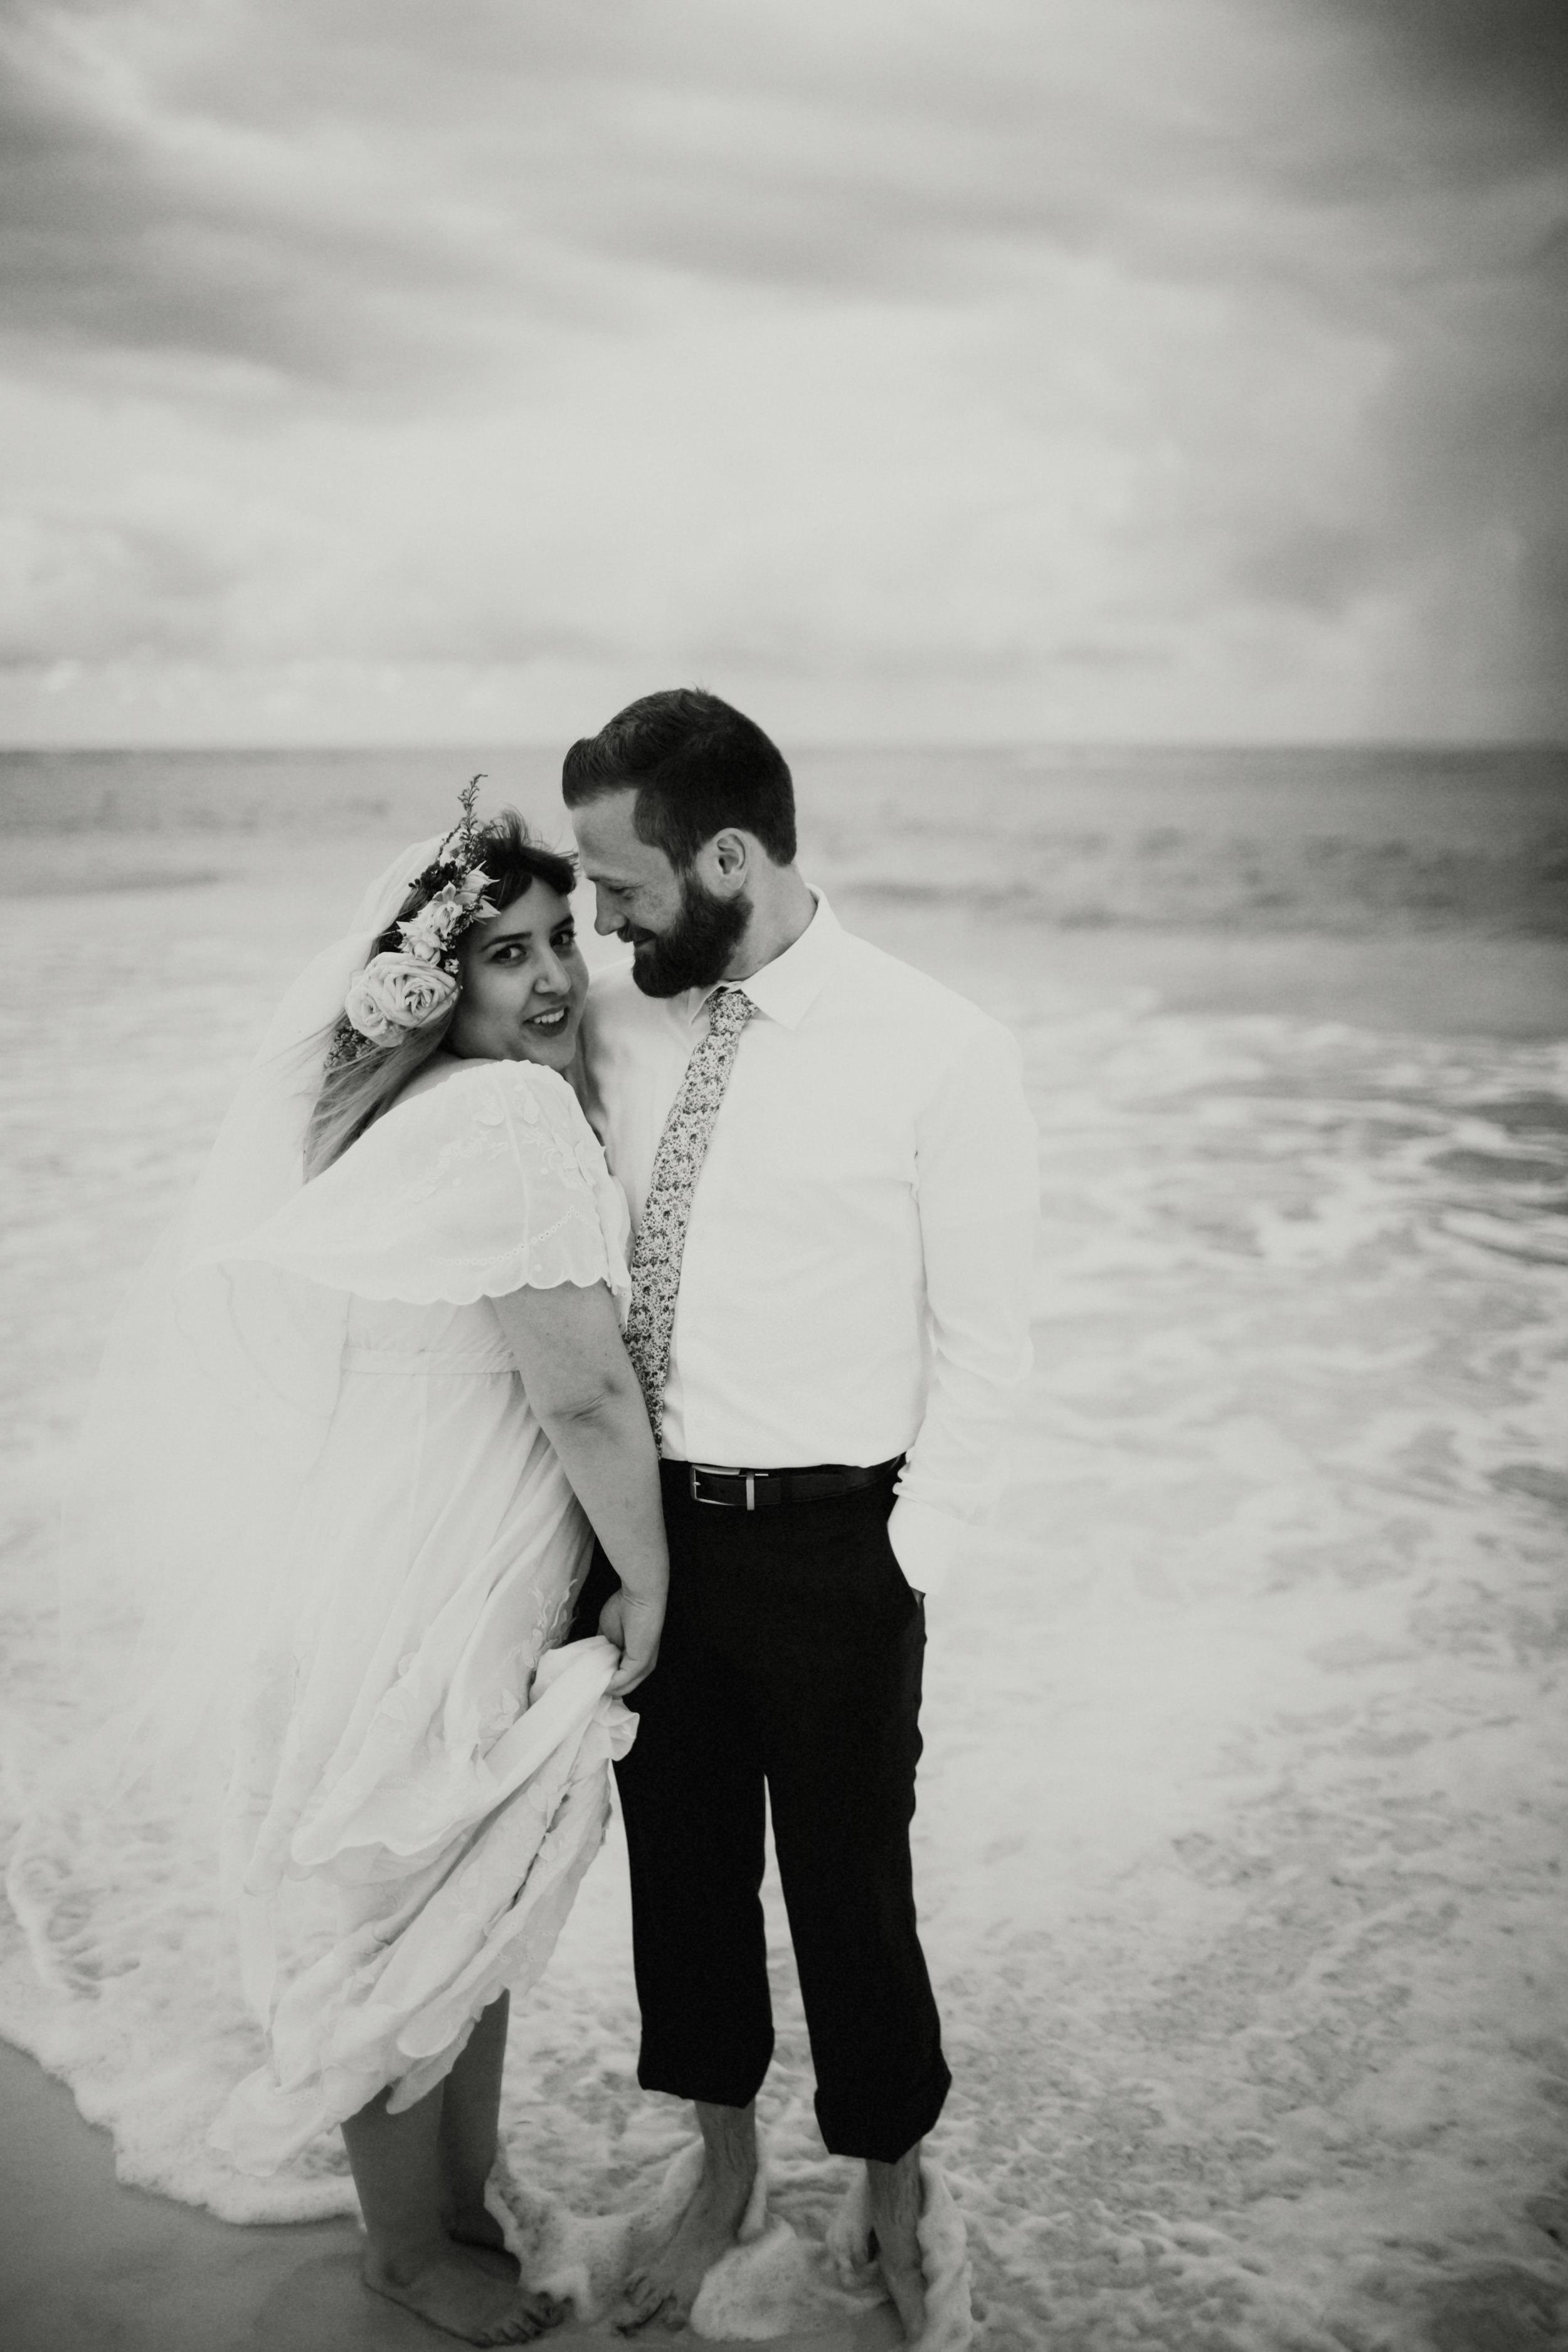 I-Got-You-Babe-Weddings-Hannah-Brent-Anniversary0061.JPG